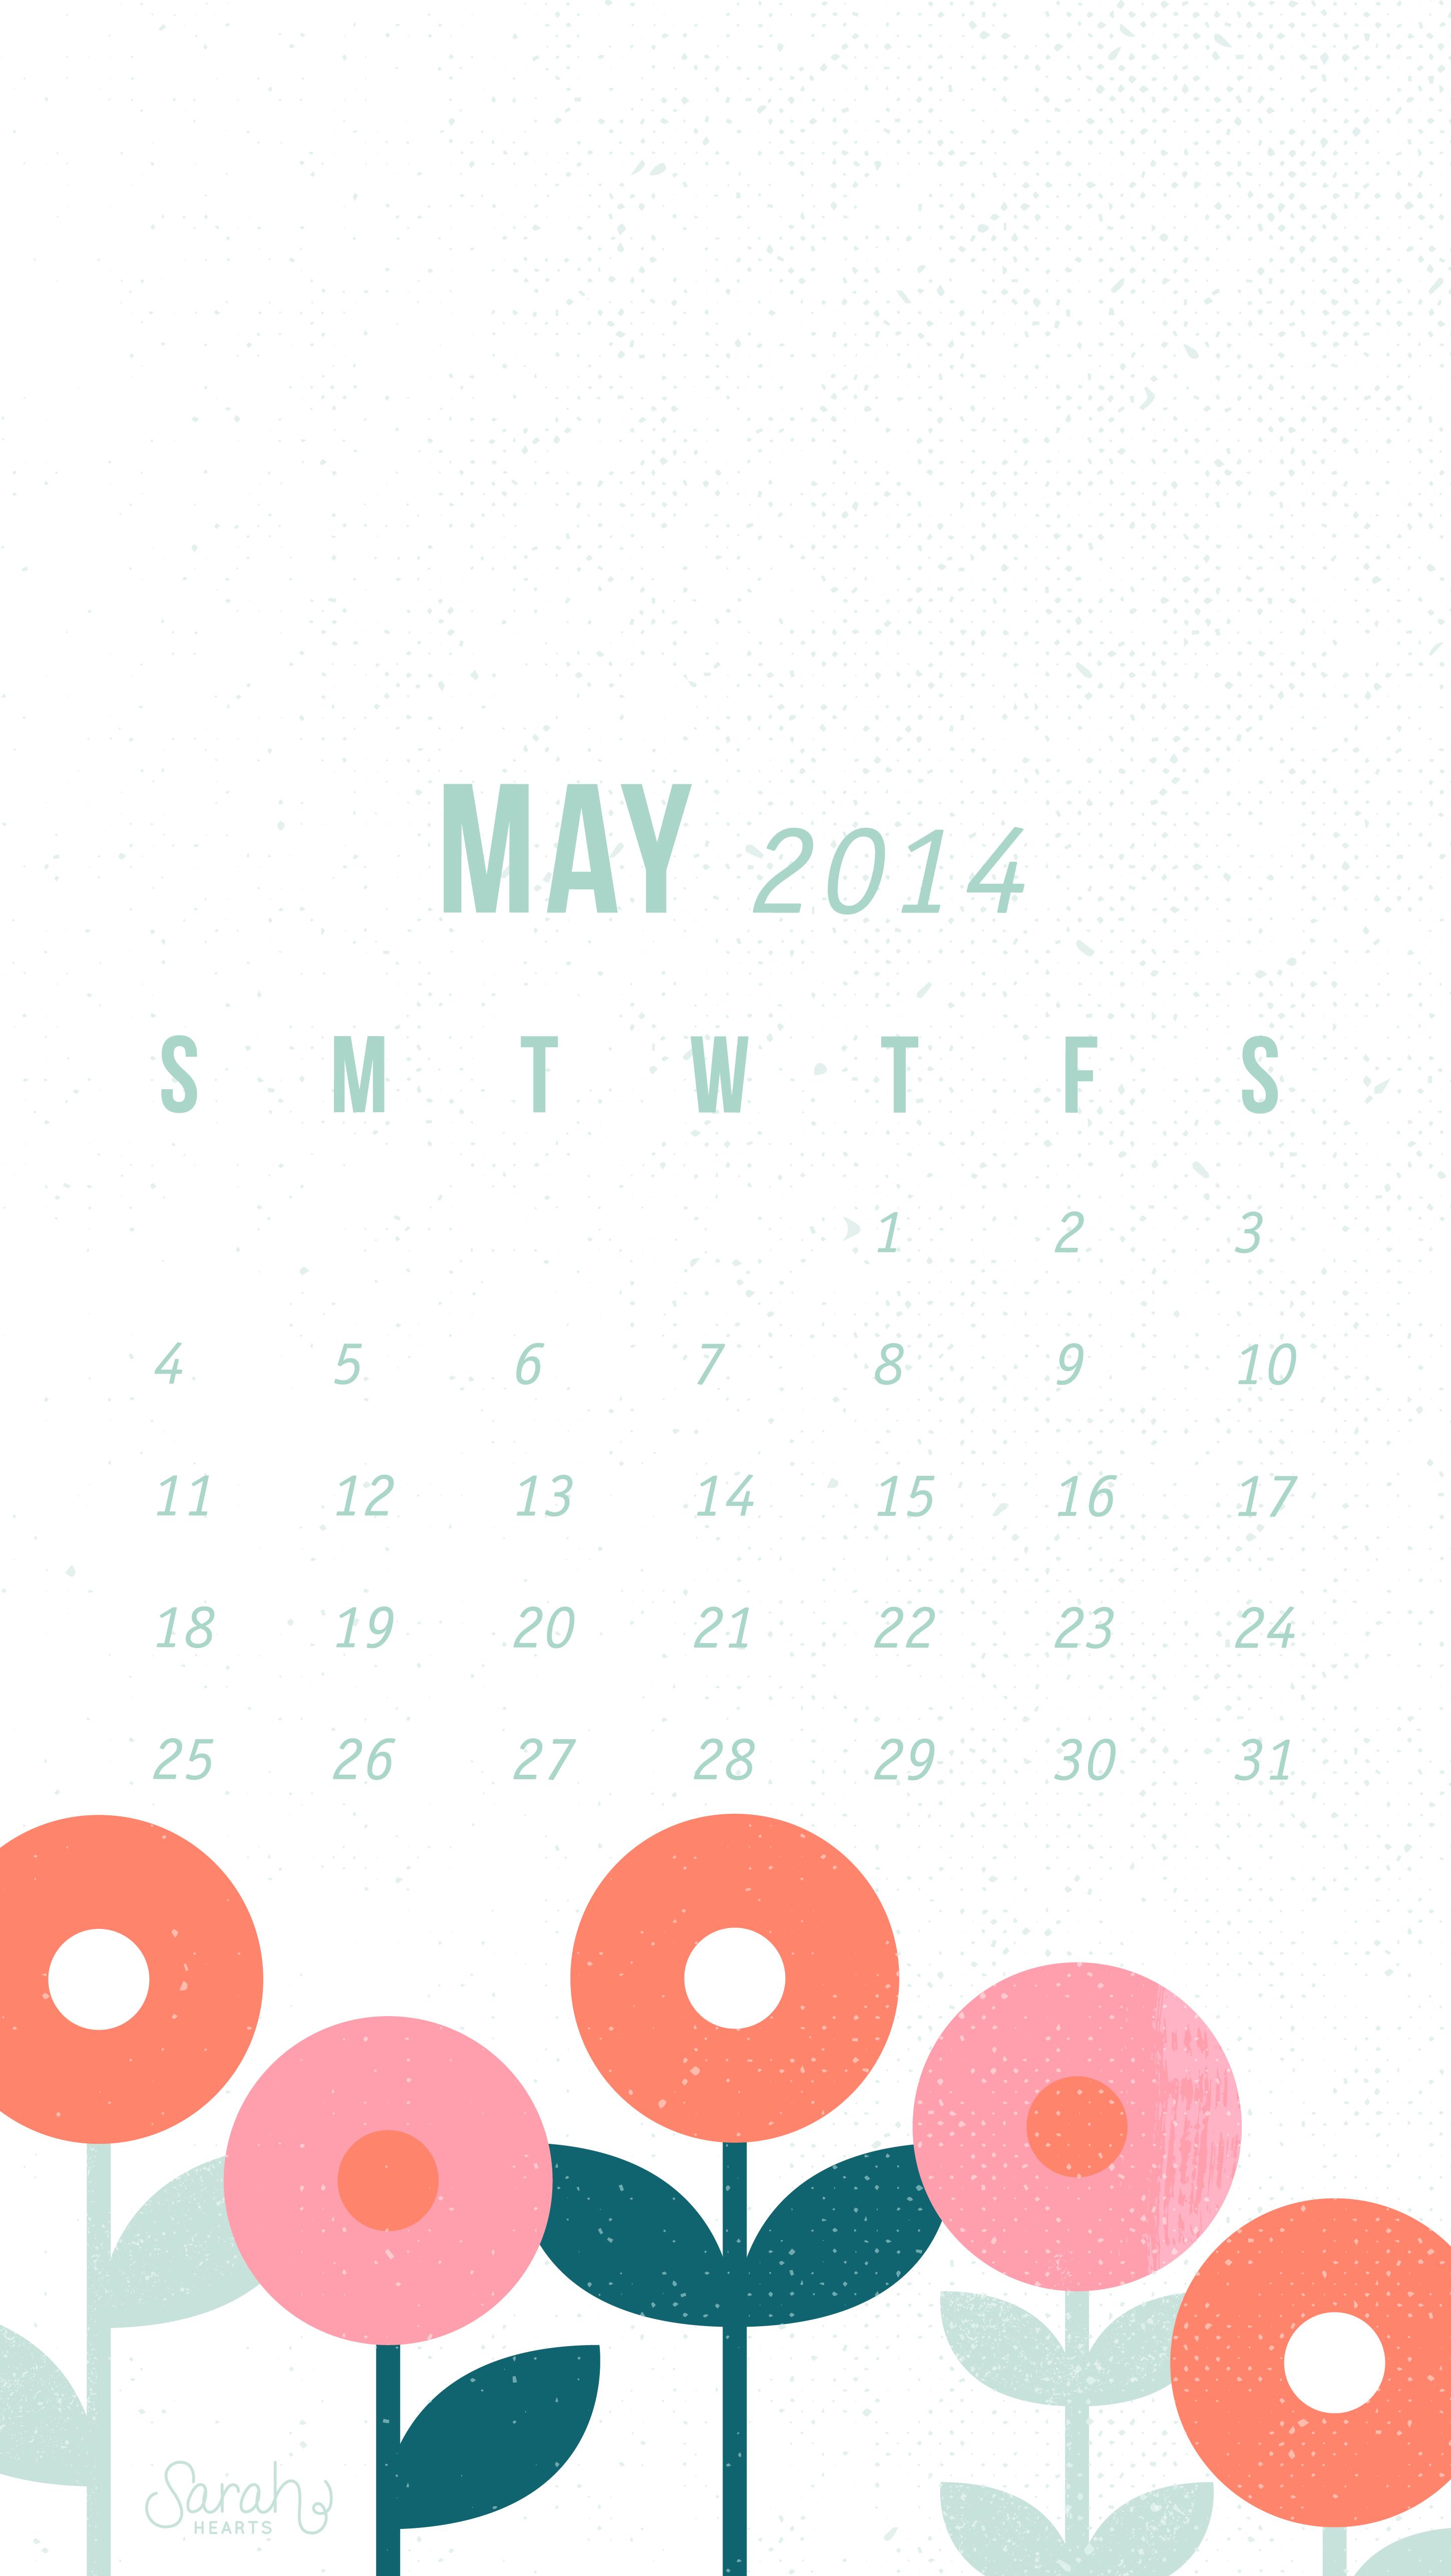 Iphone Wallpaper Cute Couple May 2014 Calendar Wallpapers Sarah Hearts